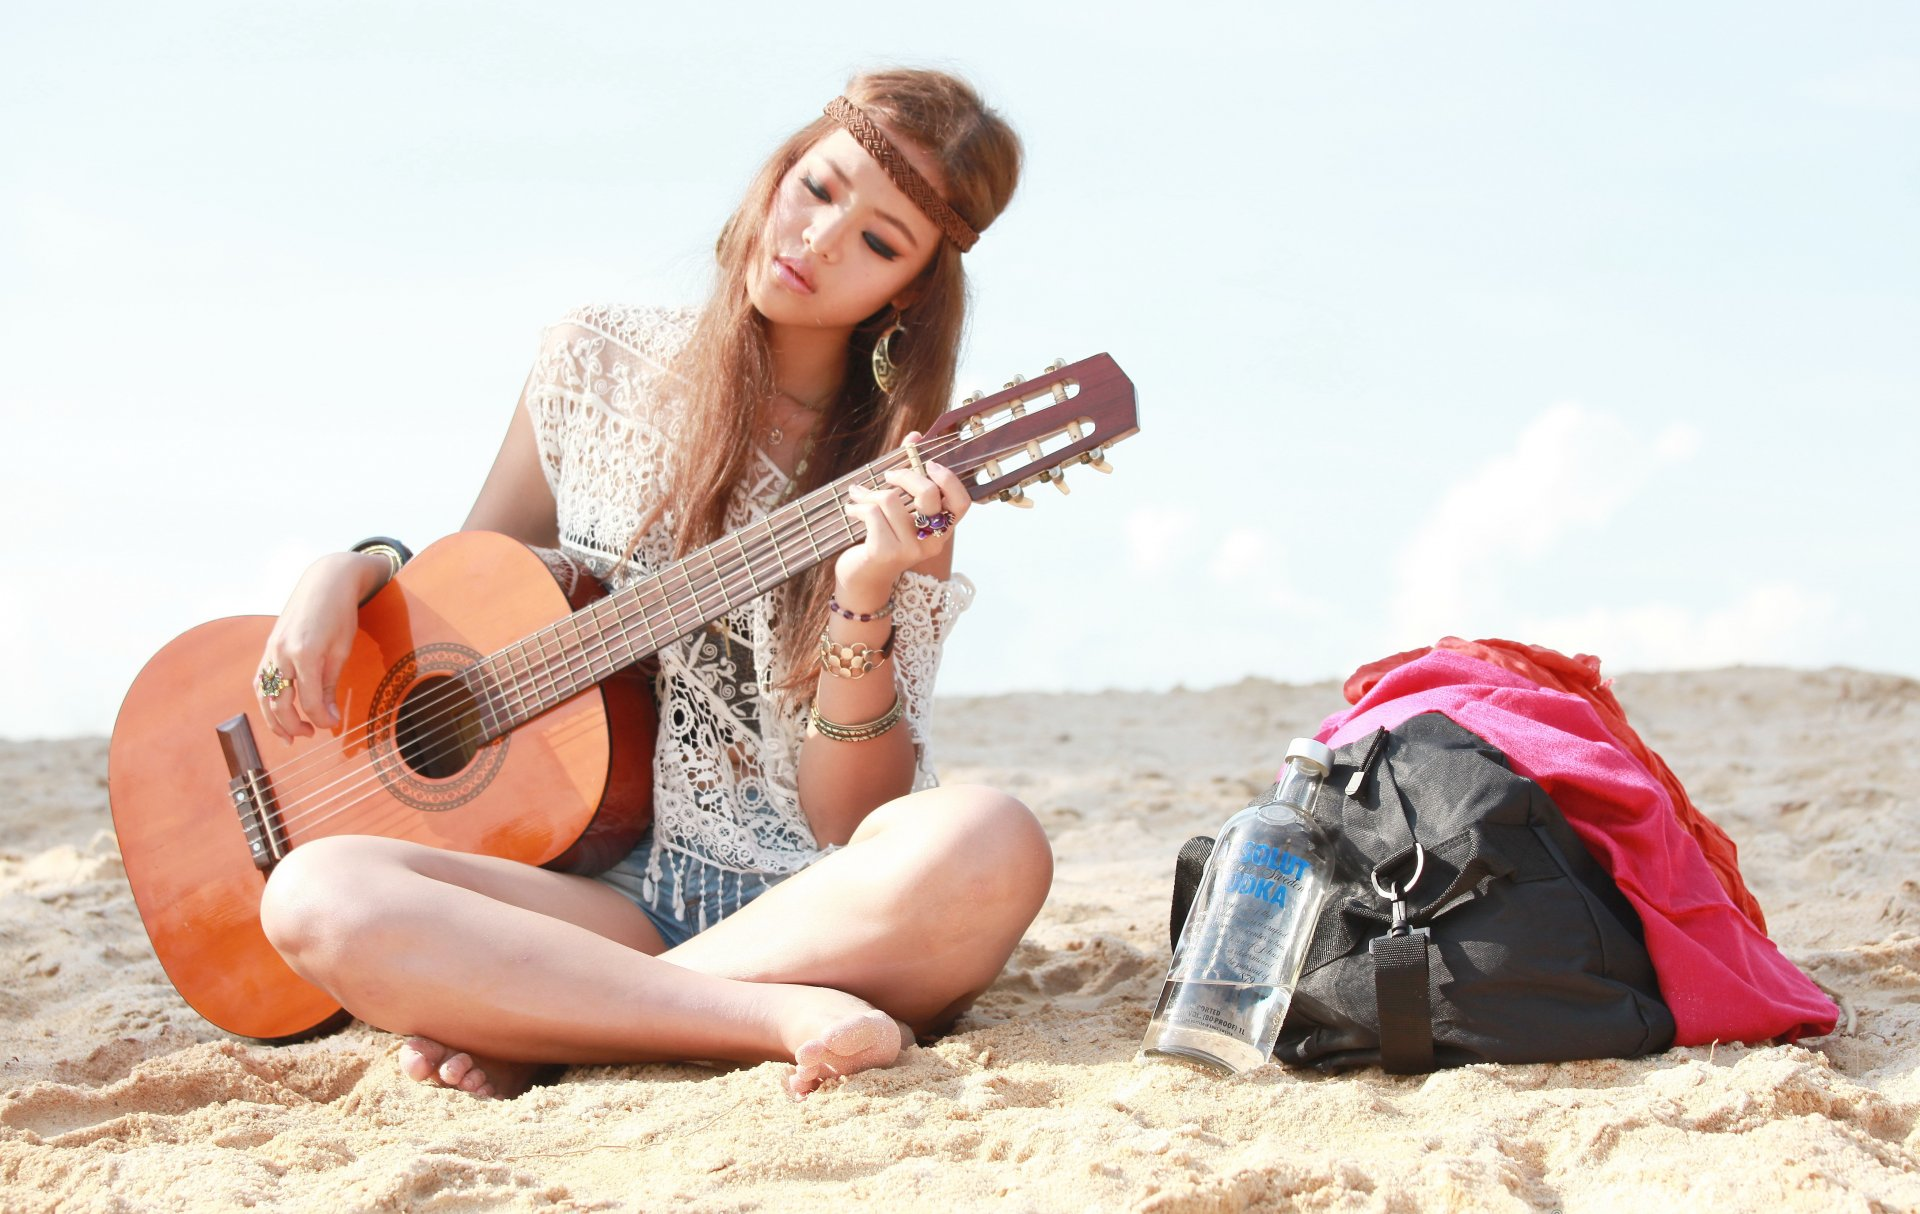 Гитара картинки на которой играет девушка